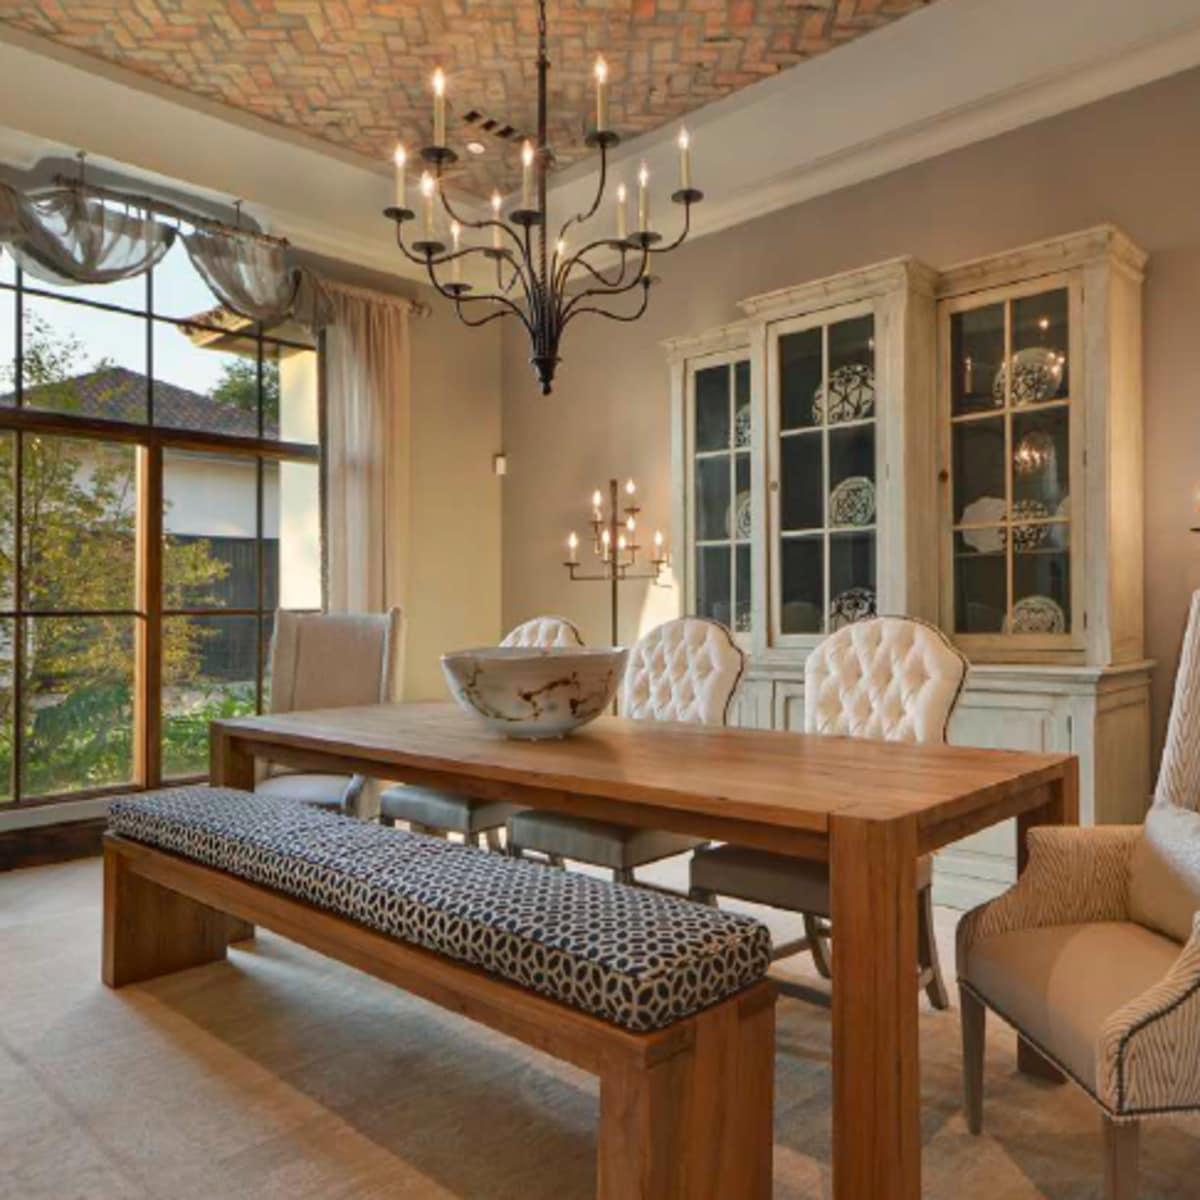 J.J. Redick Austin home for sale 3001 Toro Ring St.